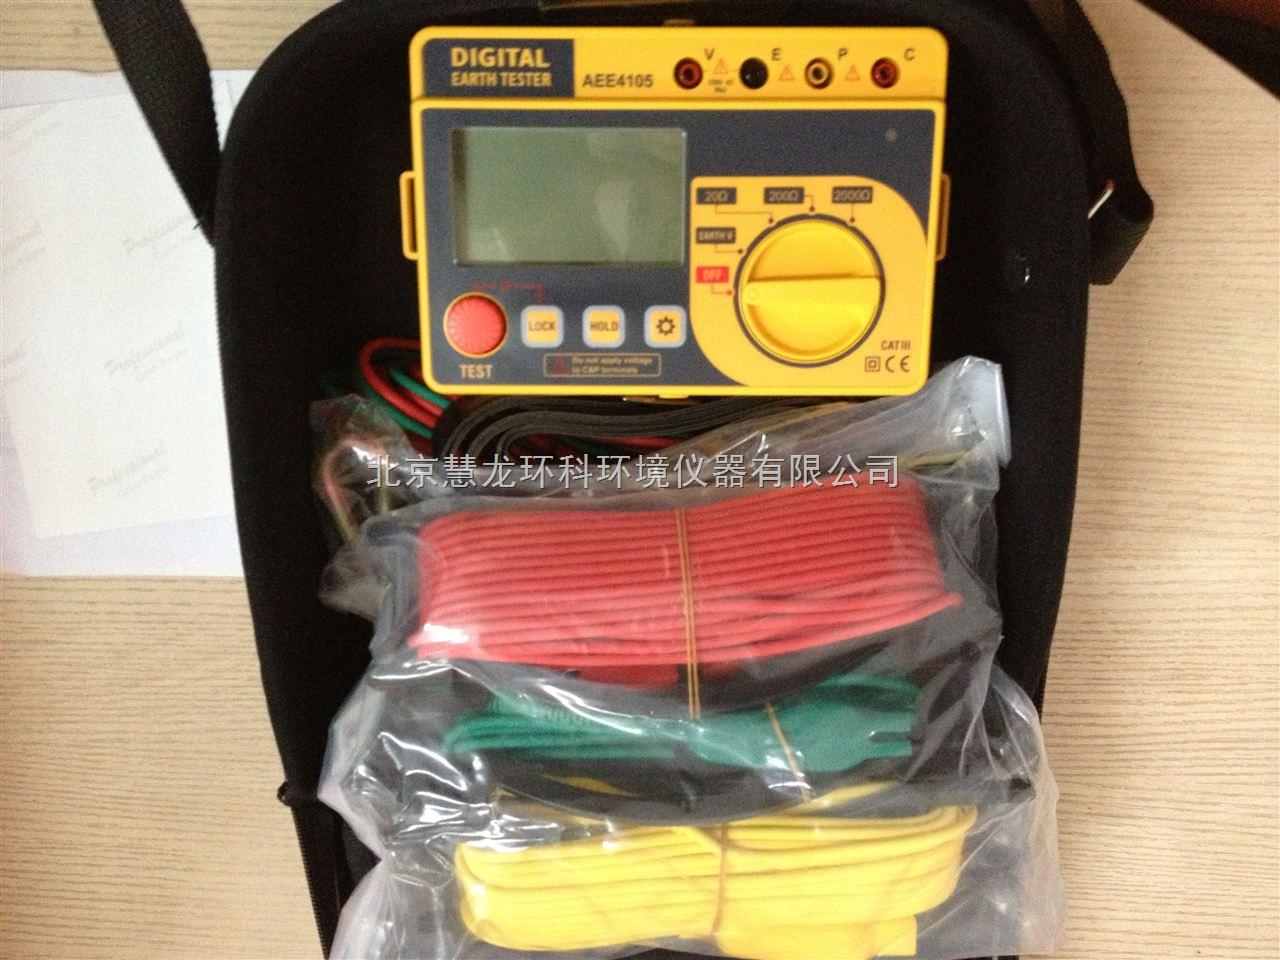 aee4105 接地电阻测试仪